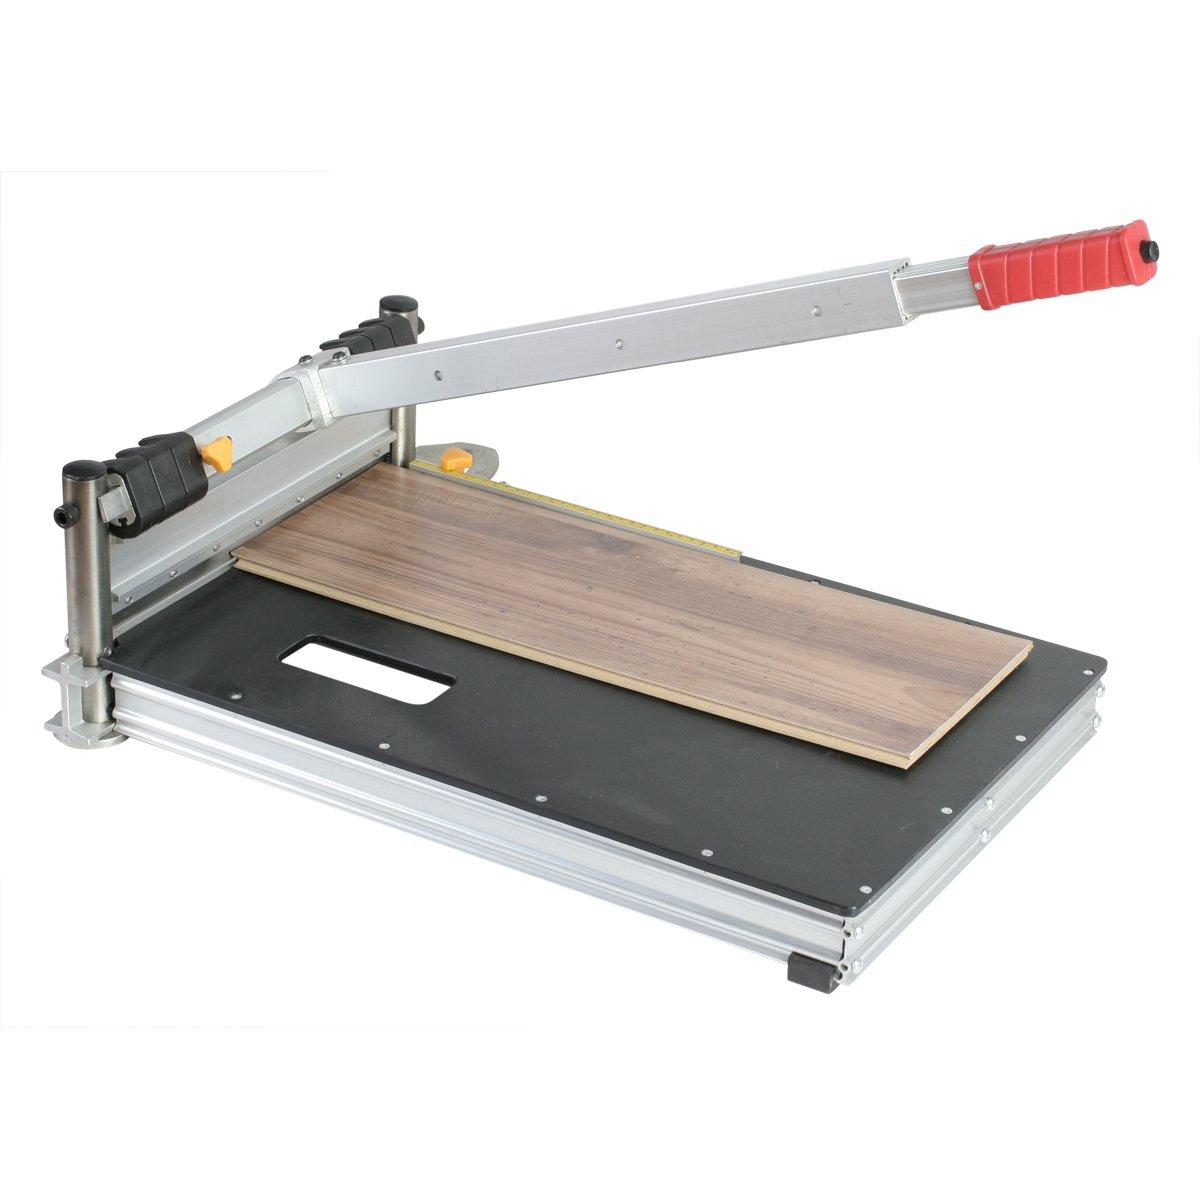 EAB Tool 2100007 Stay Sharp Multi-Purpose Flooring Cutter, 13'' by EAB Tool